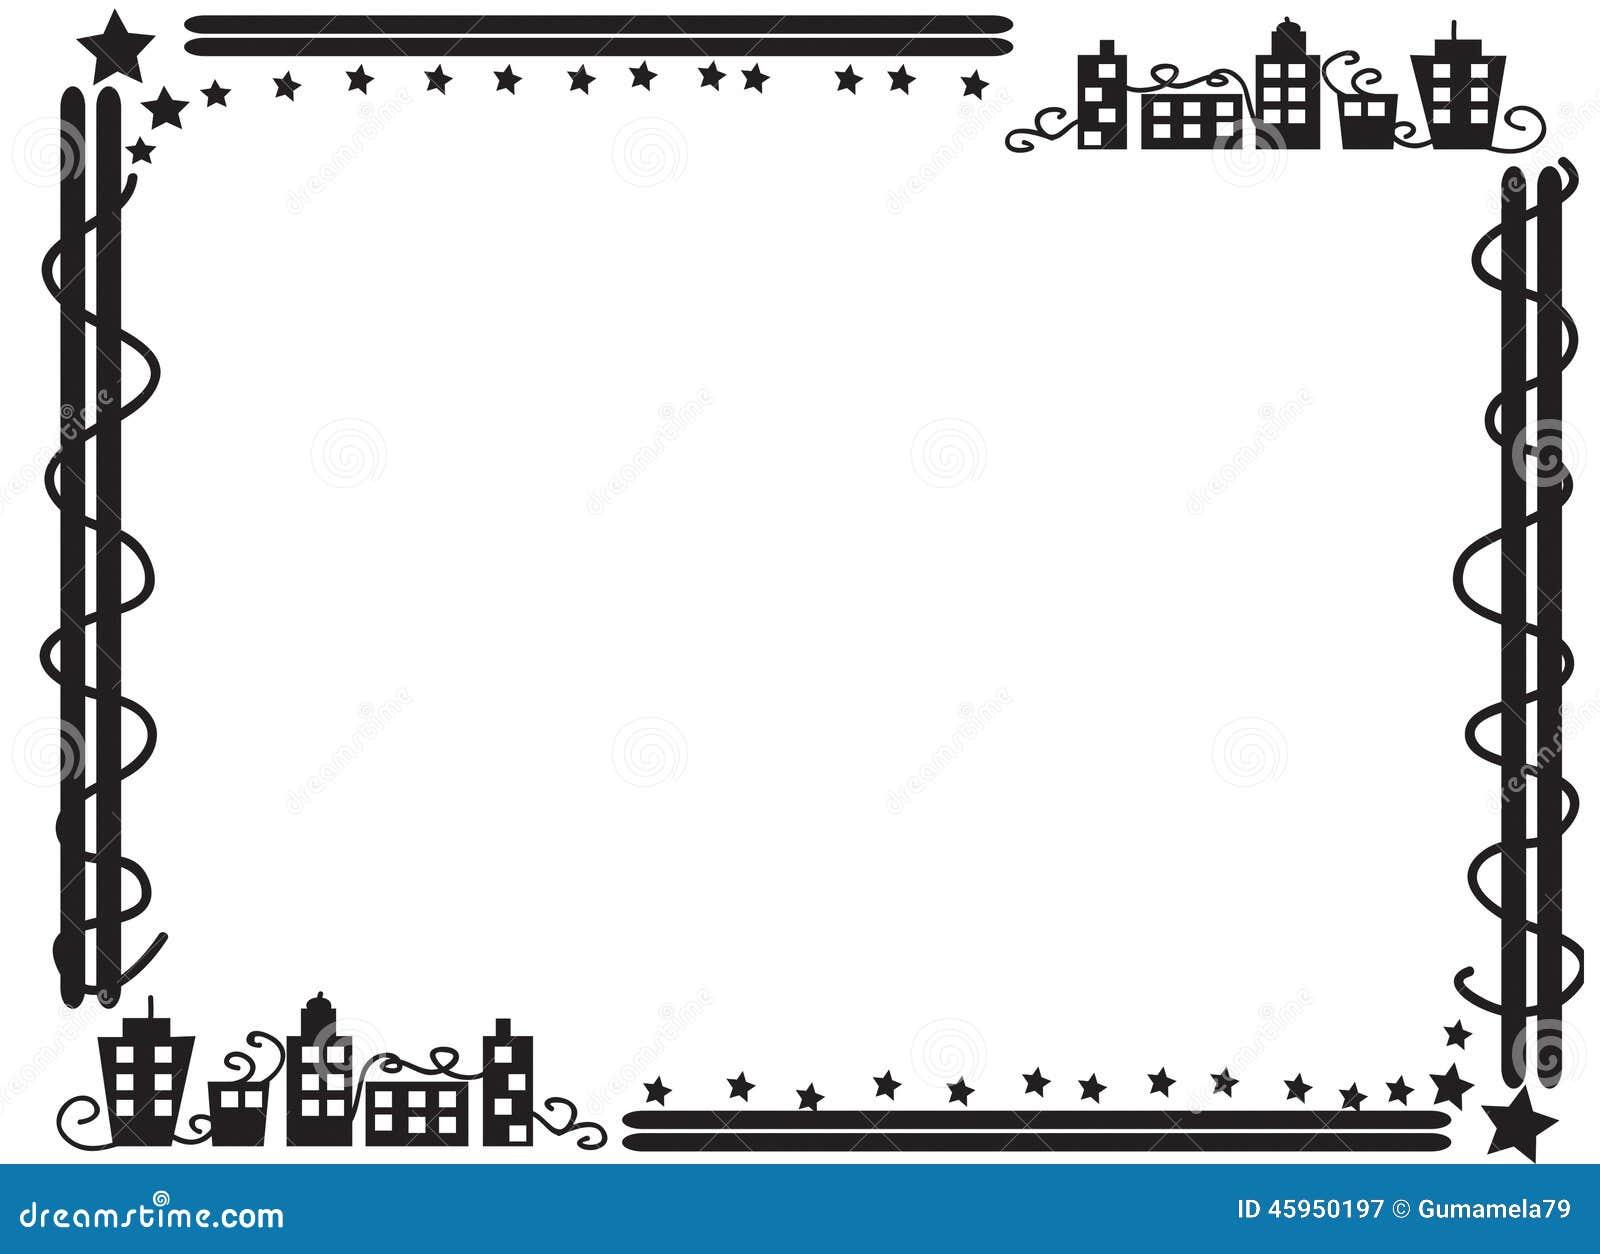 decorative frame border of buildings stock illustration